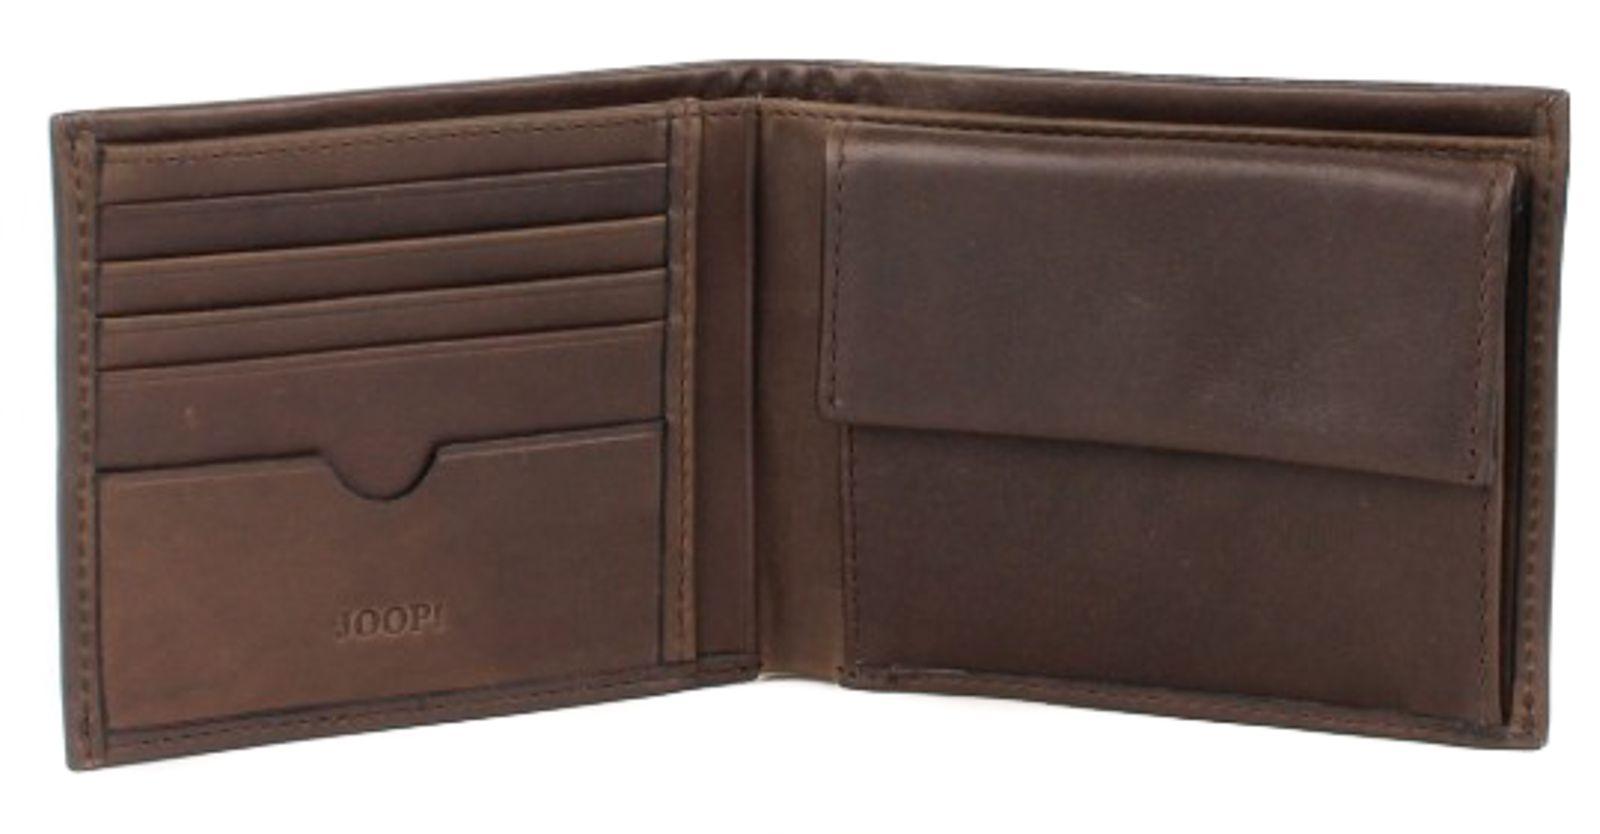 JOOP! Ninos Liana 10 Card Wallet Dark Brown